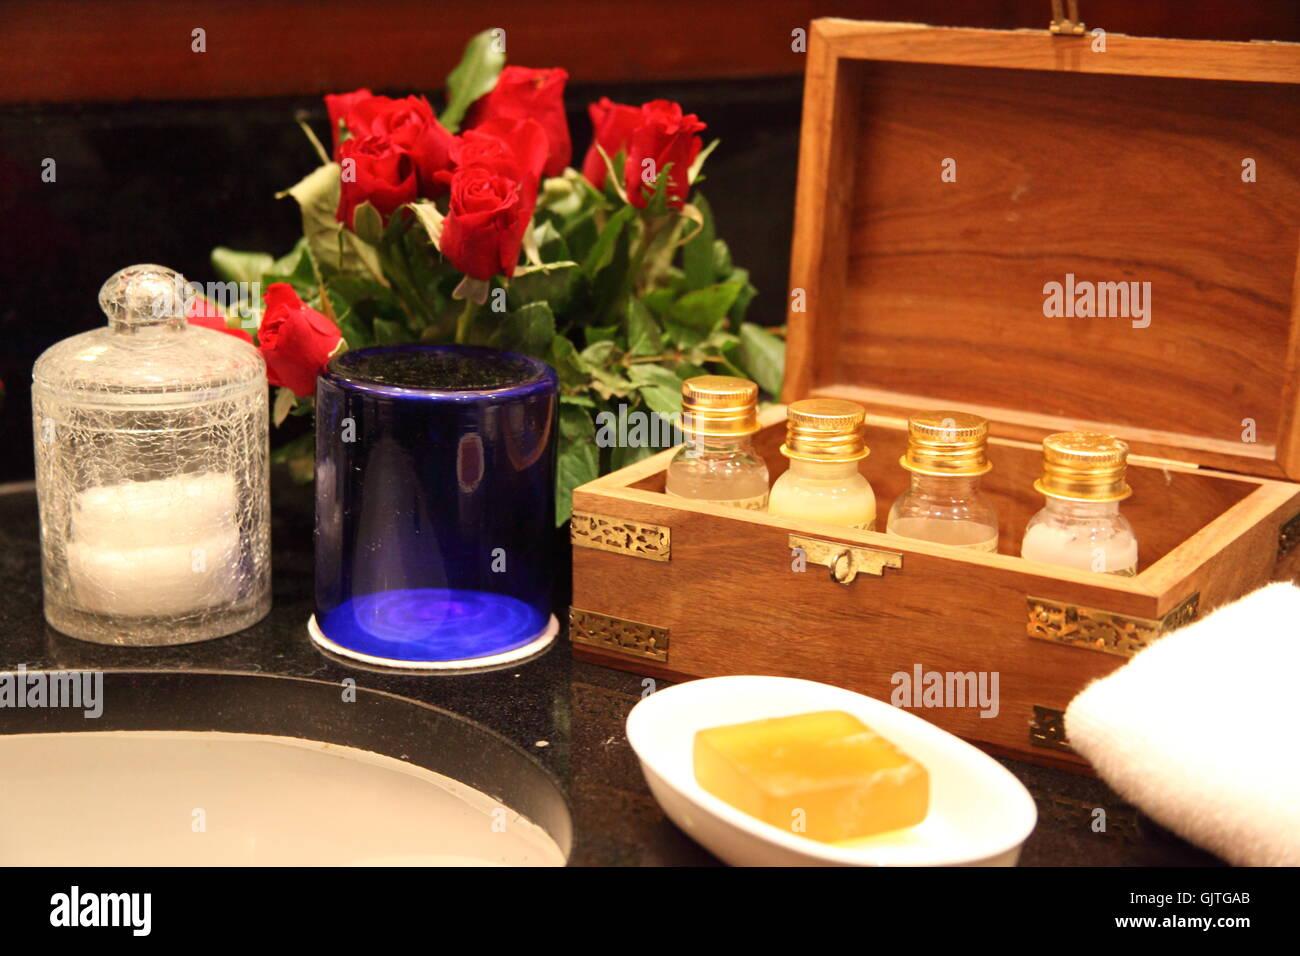 indoor photo hotel wash basin - Stock Image